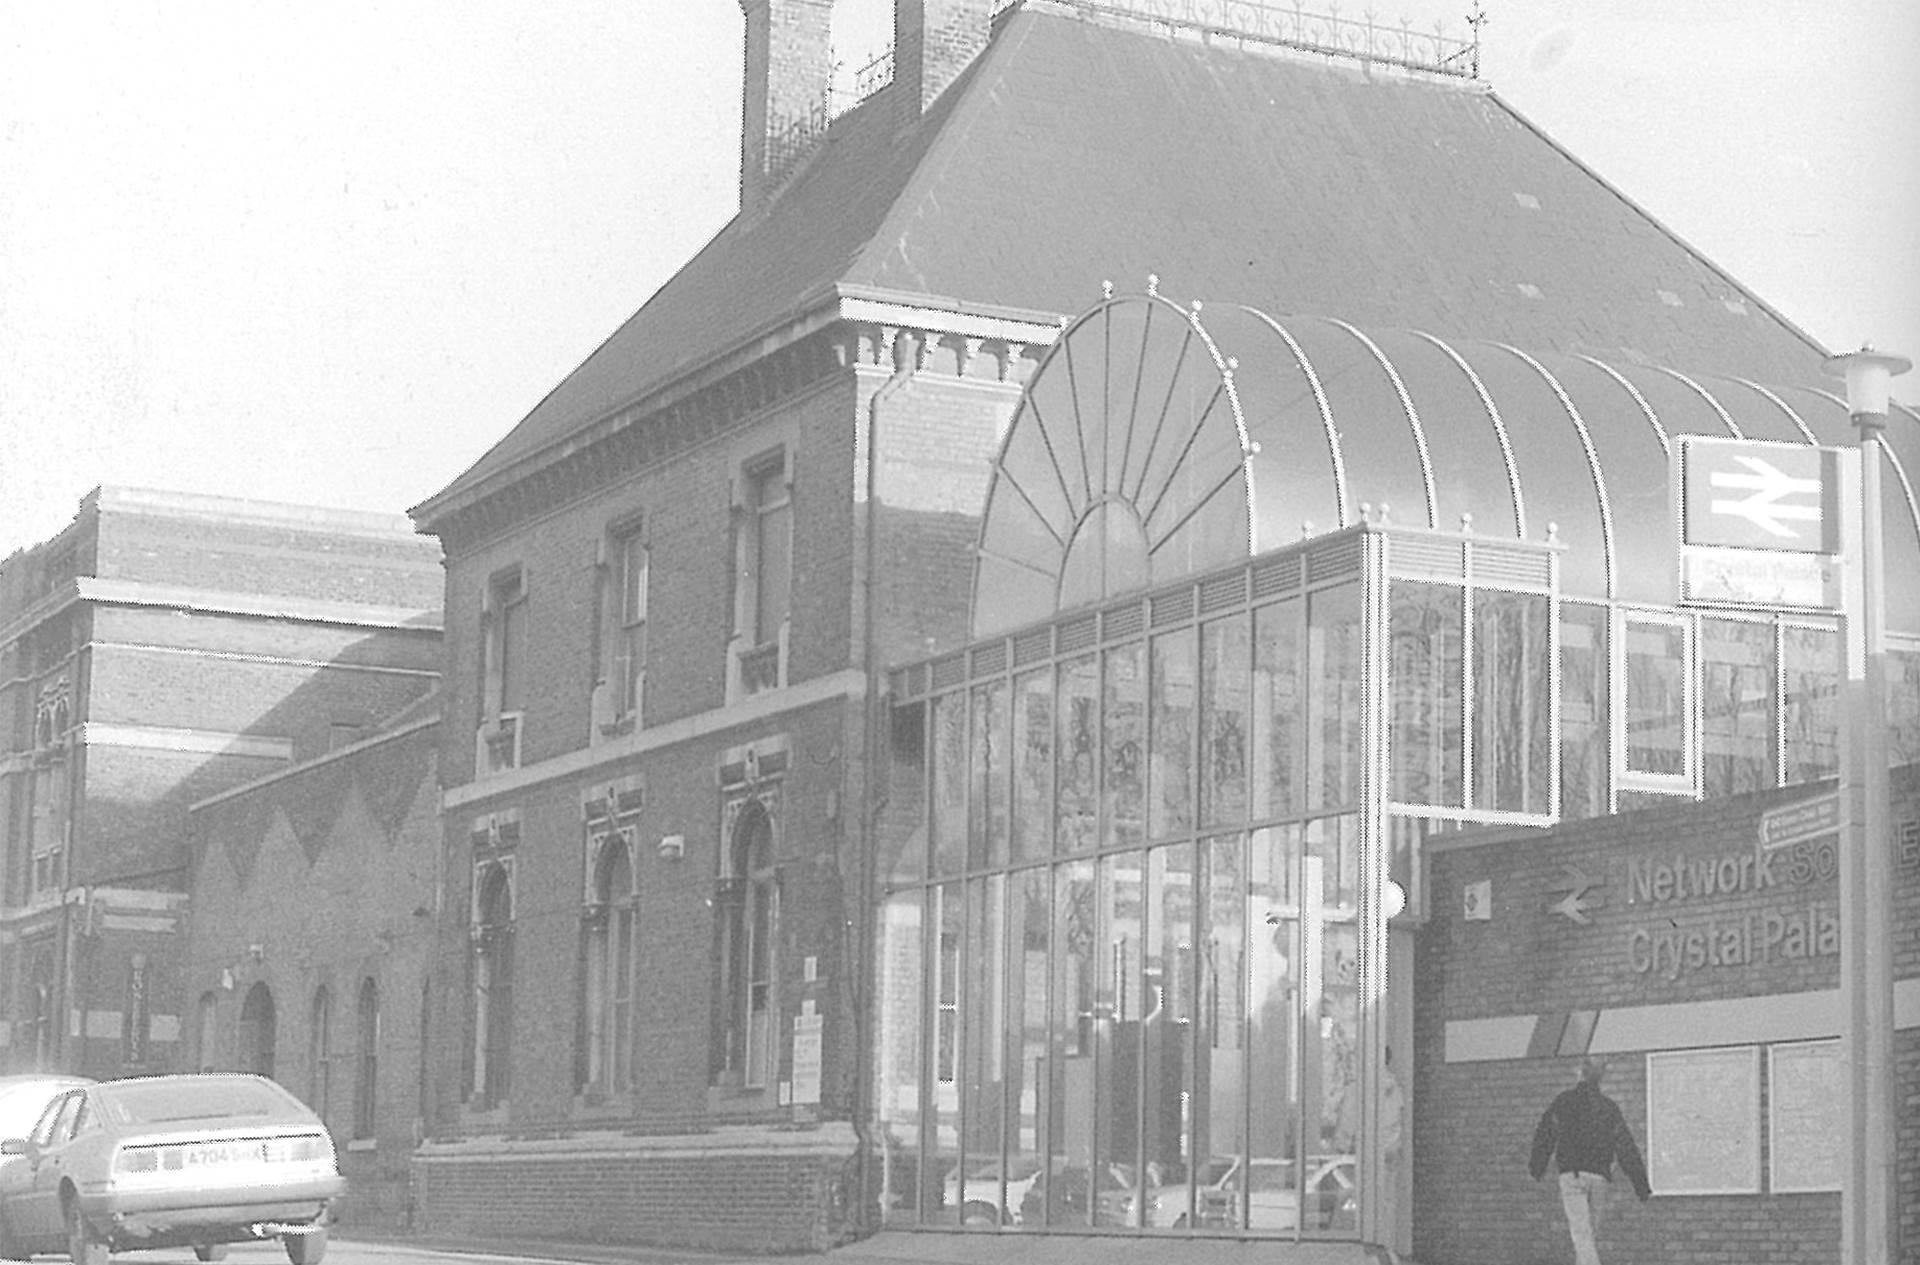 6 Crystal Palace Station